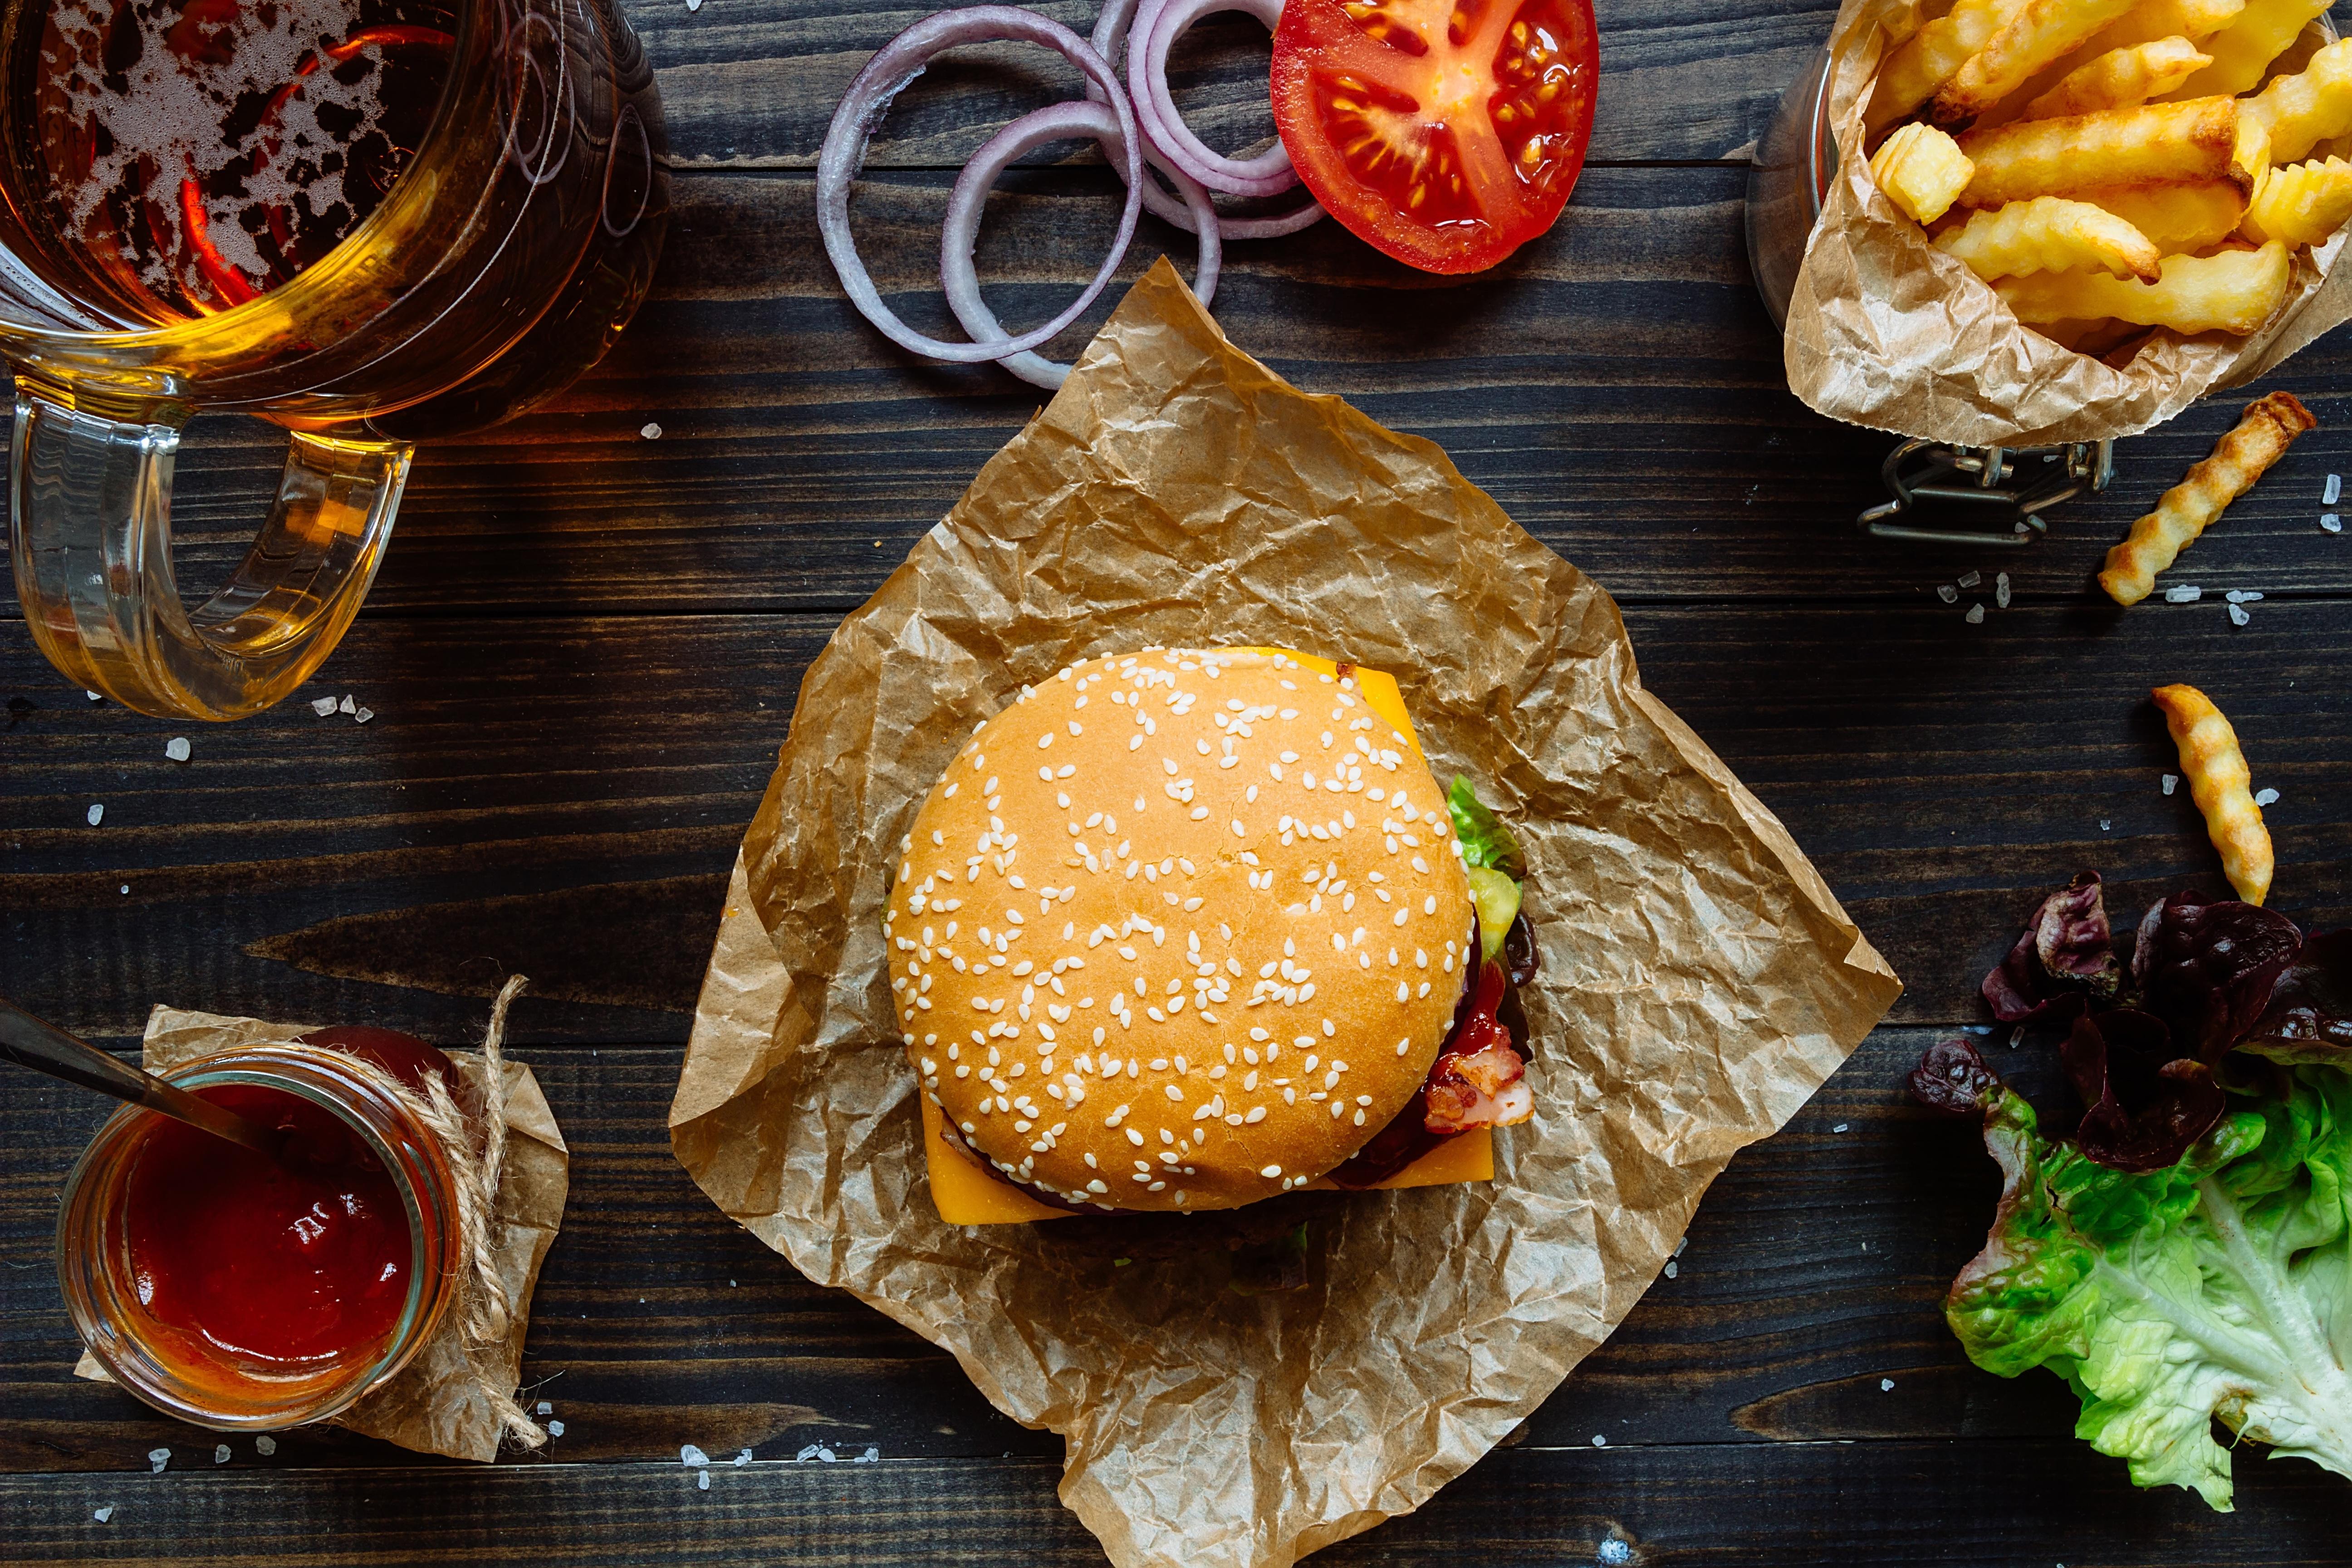 еда гамбургер лук бесплатно